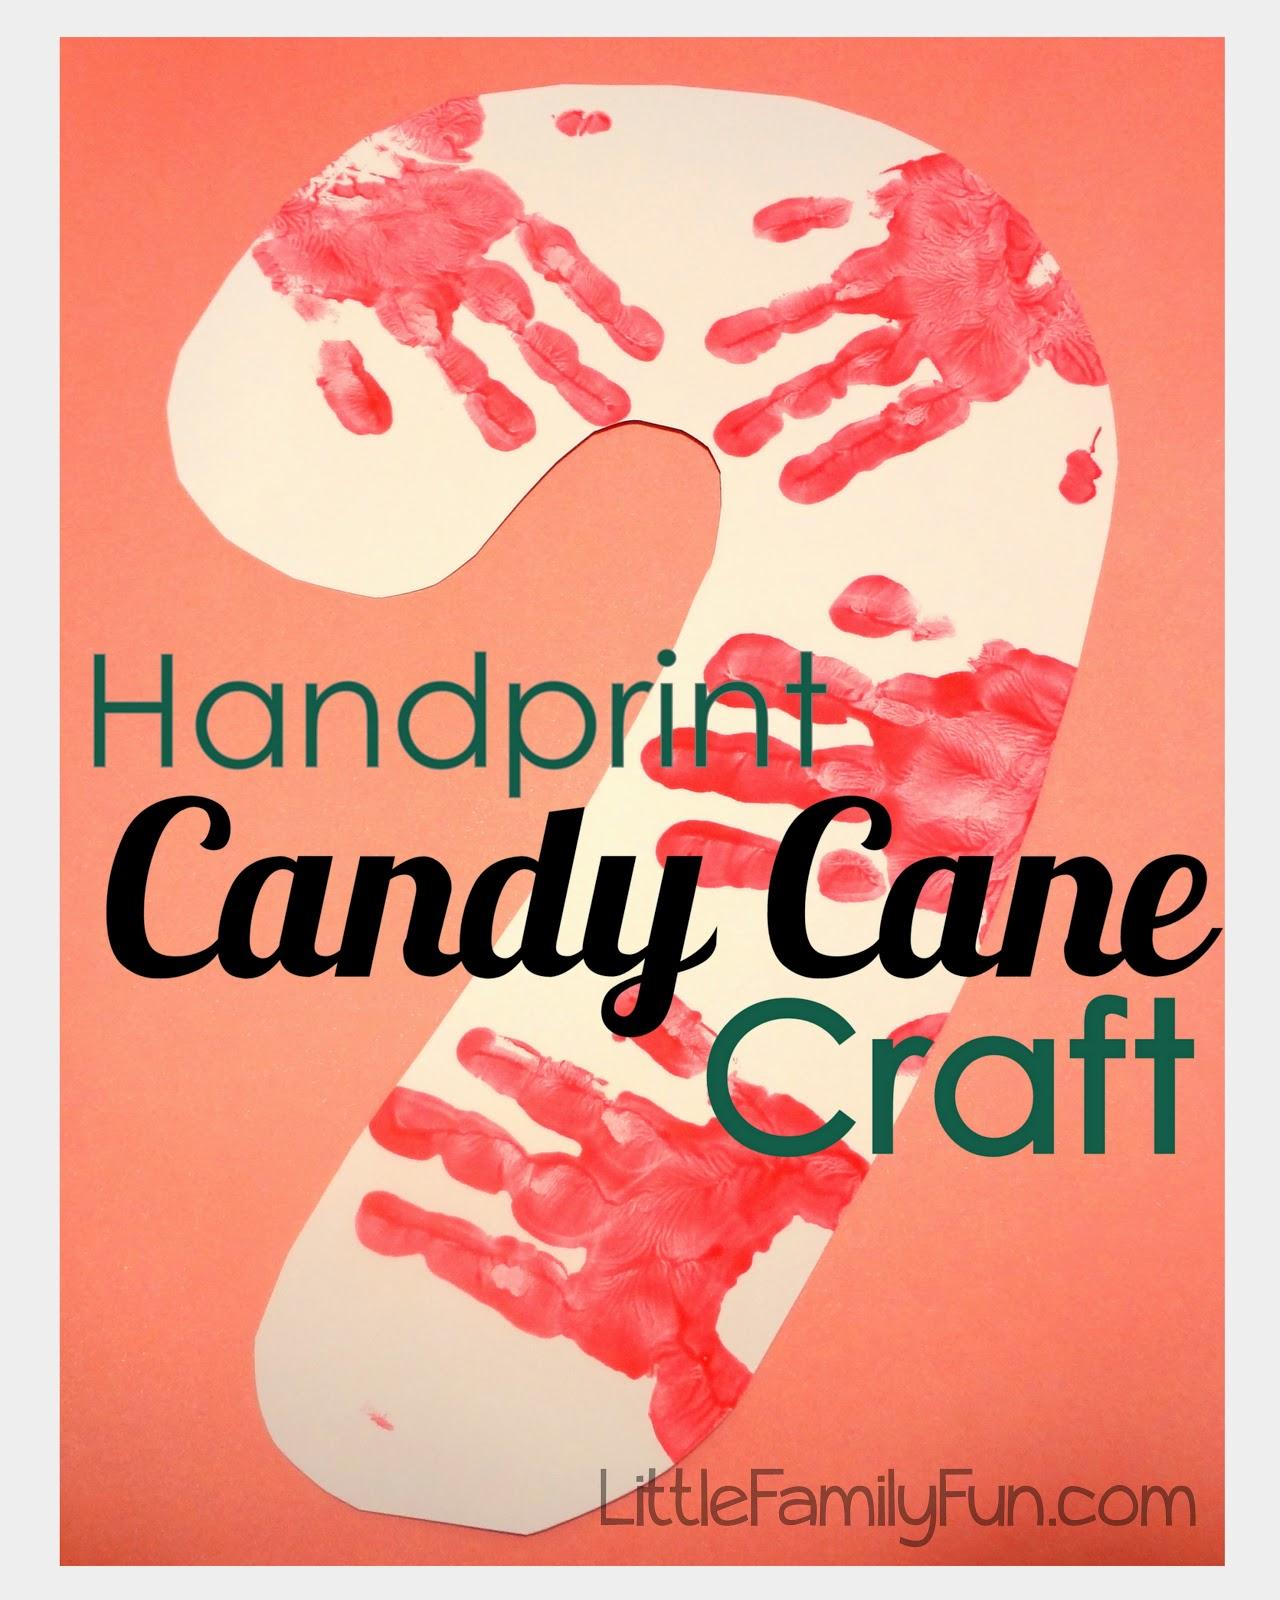 Little Family Fun Handprint Candy Cane Craft